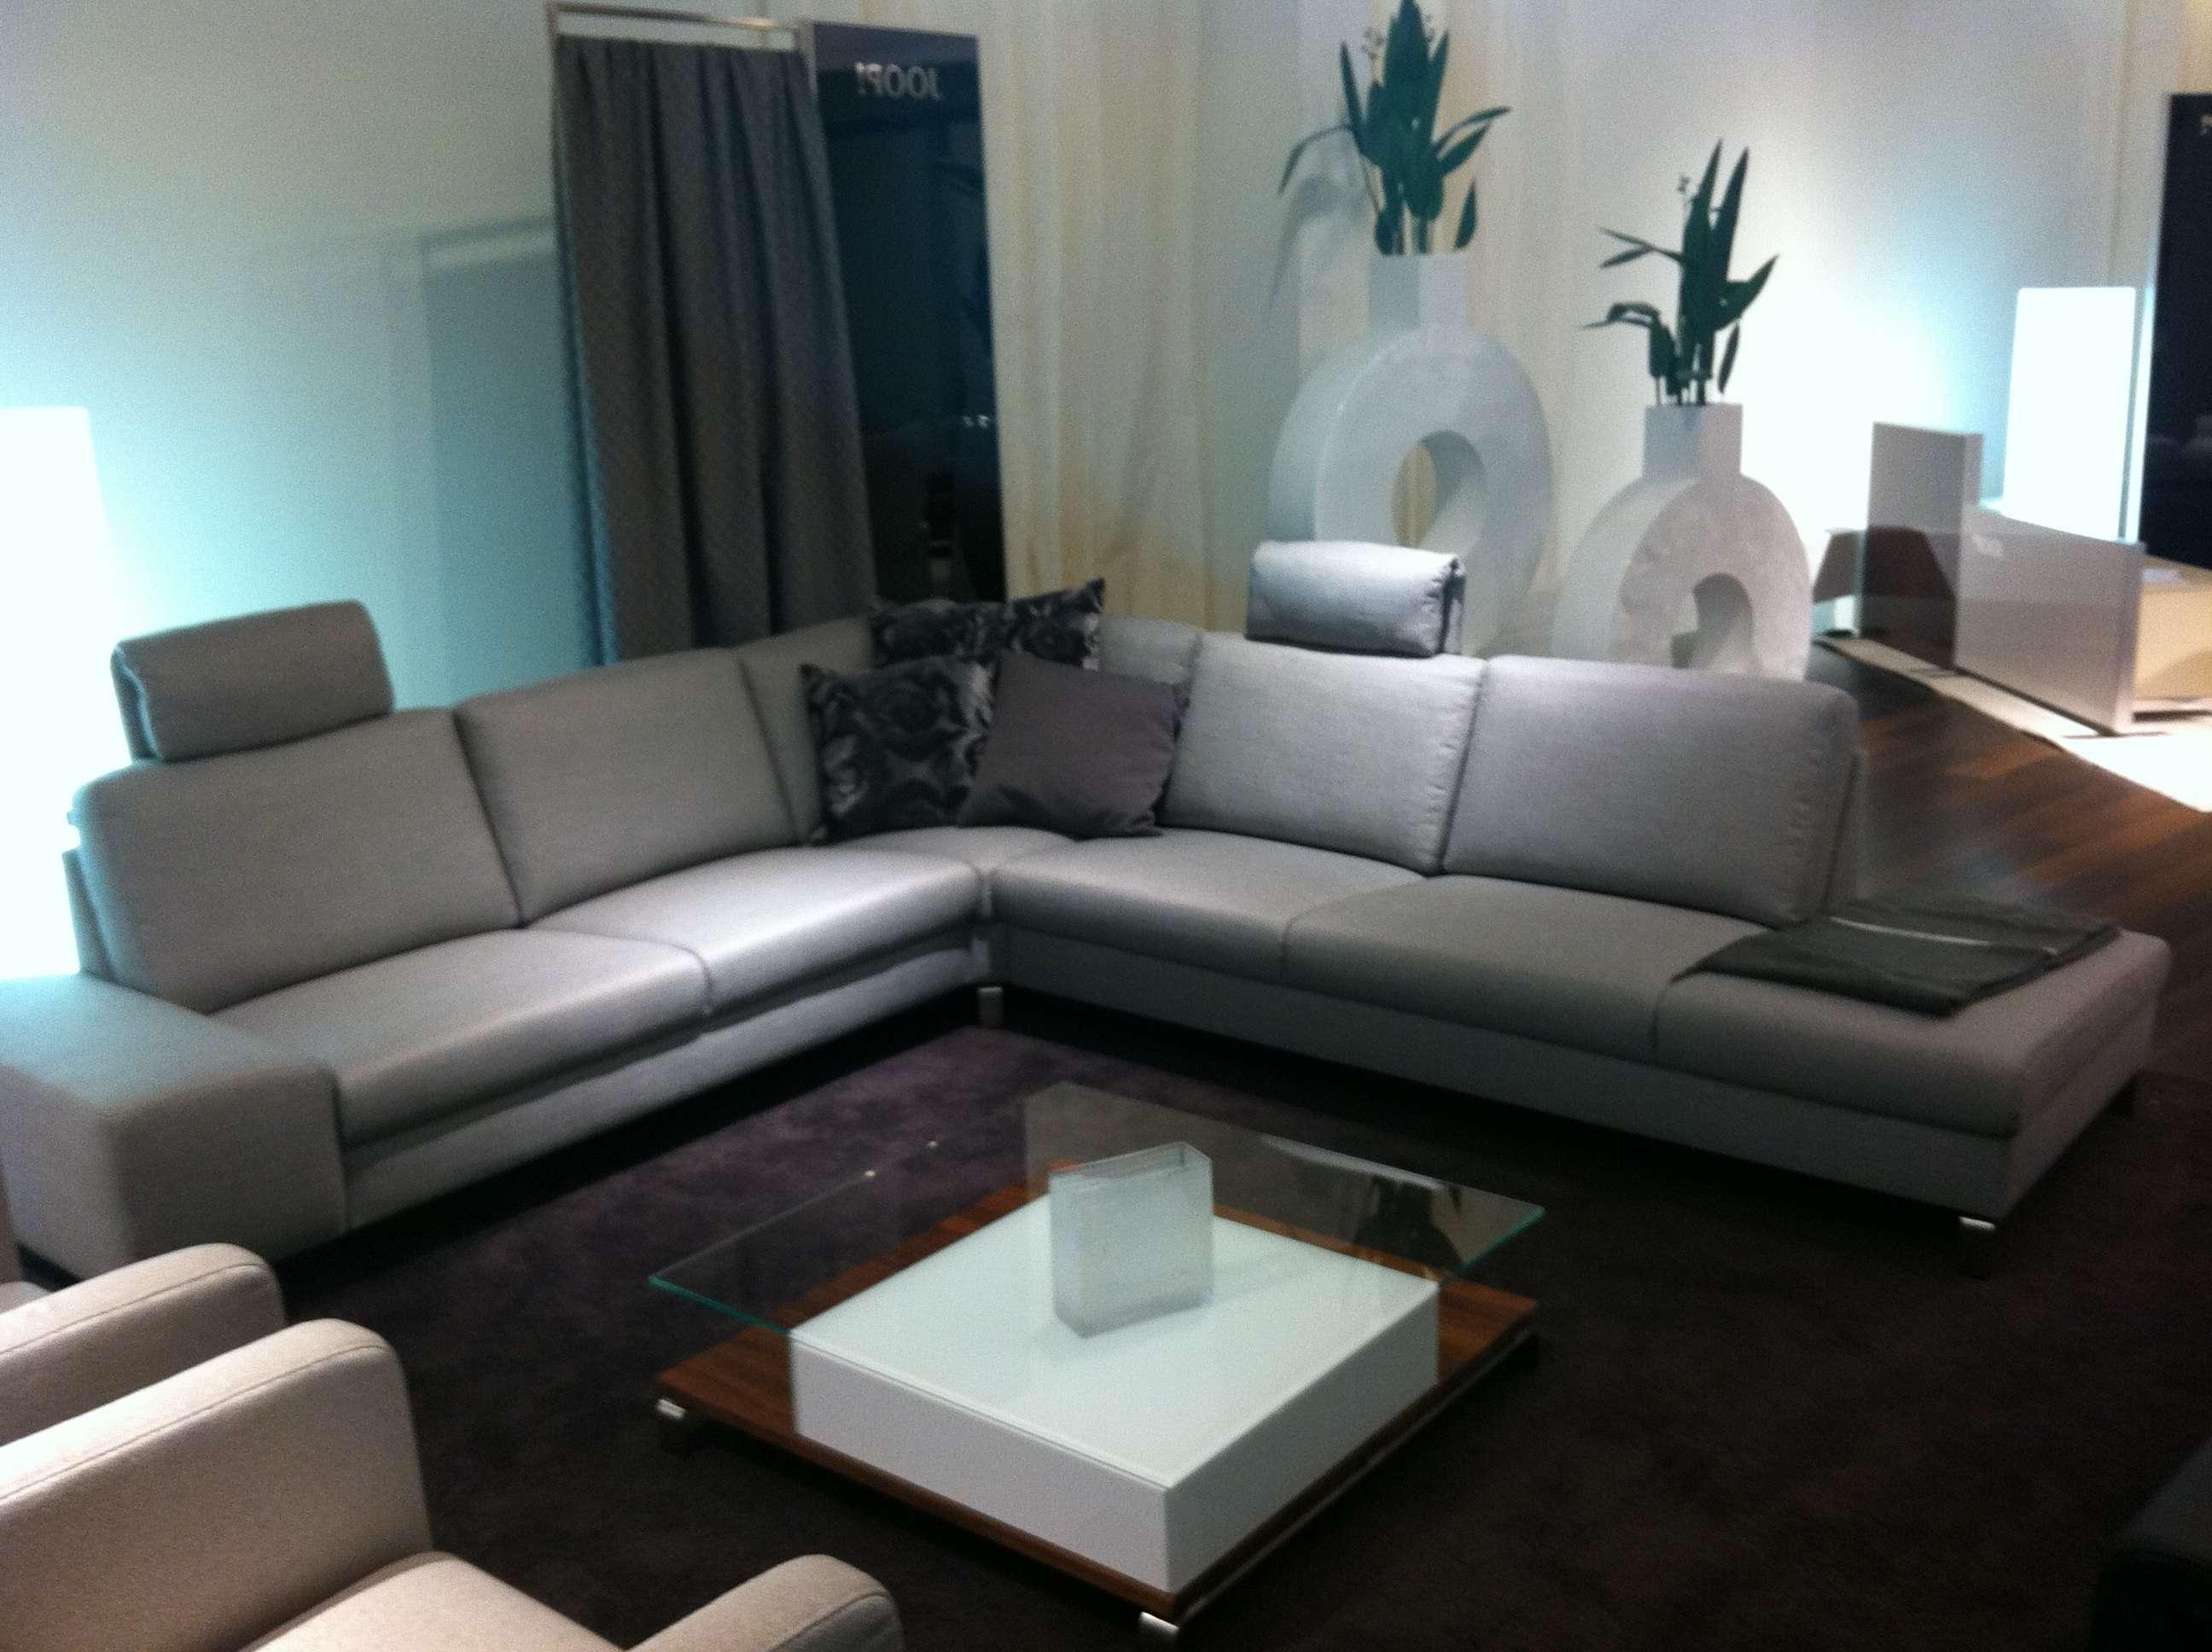 Joop! Living Room | Rossini Interiors & Designs Limited Intended For Joop Sideboards (View 10 of 20)